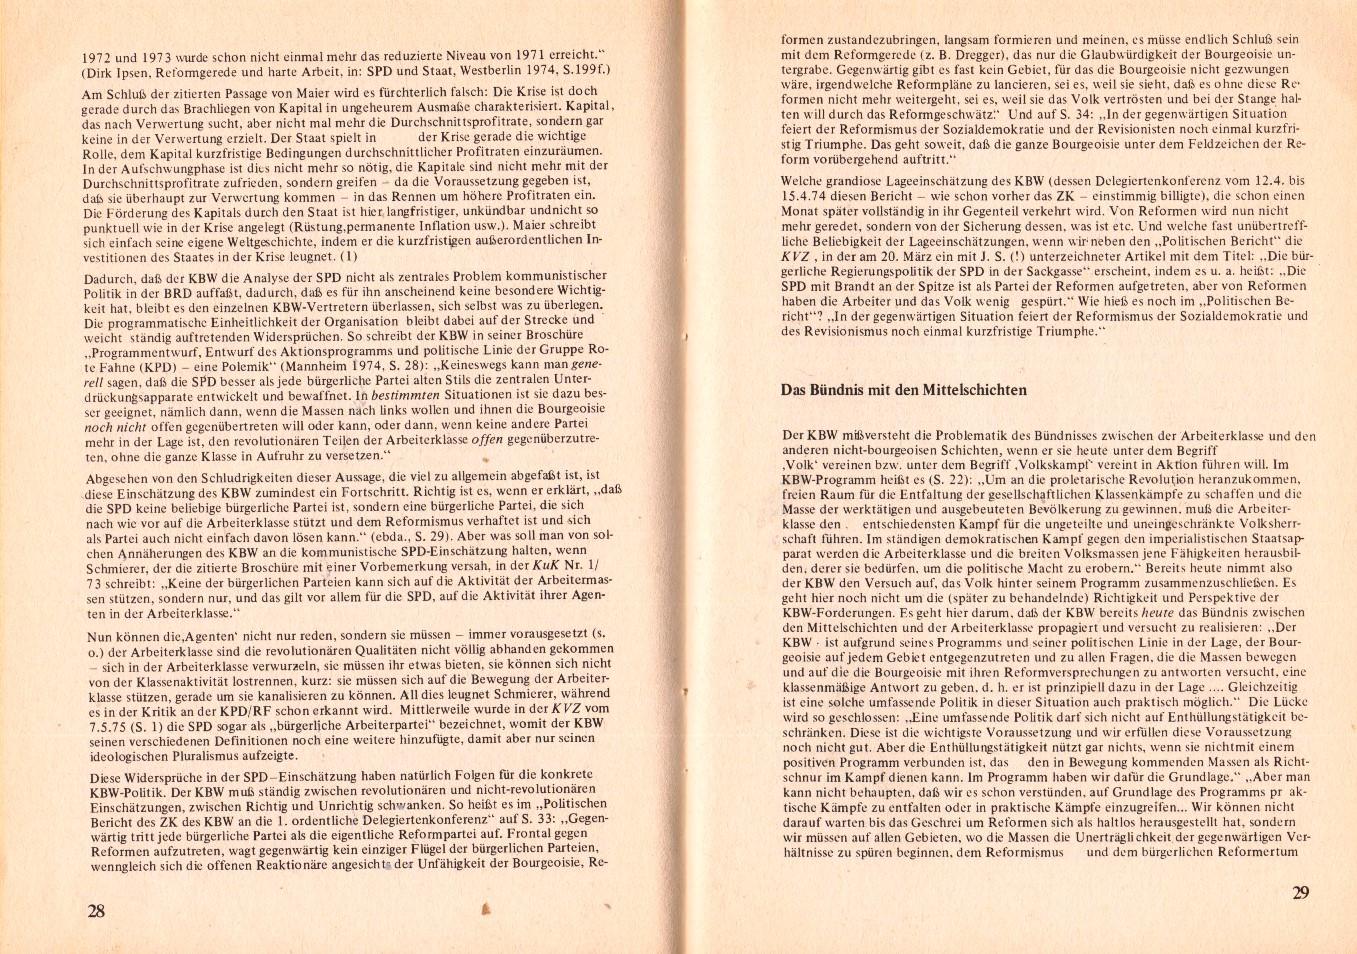 Spartacus_1975_Kritik_des_KBW_16